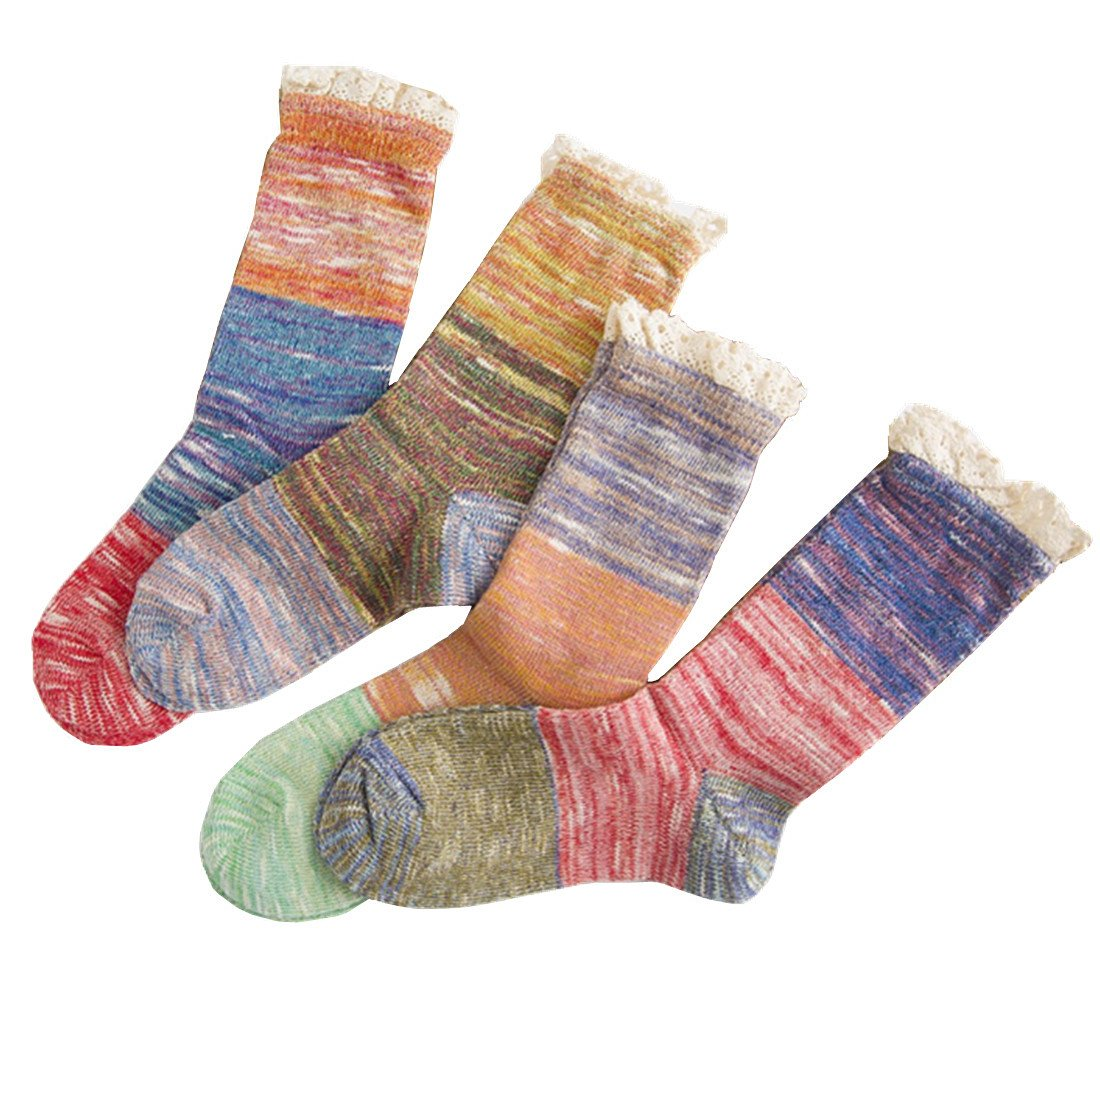 Womens Lady's 4 Pack Crochet Lace Trim Cotton Knit Boot Socks Winter Leg Warmer (model 1)